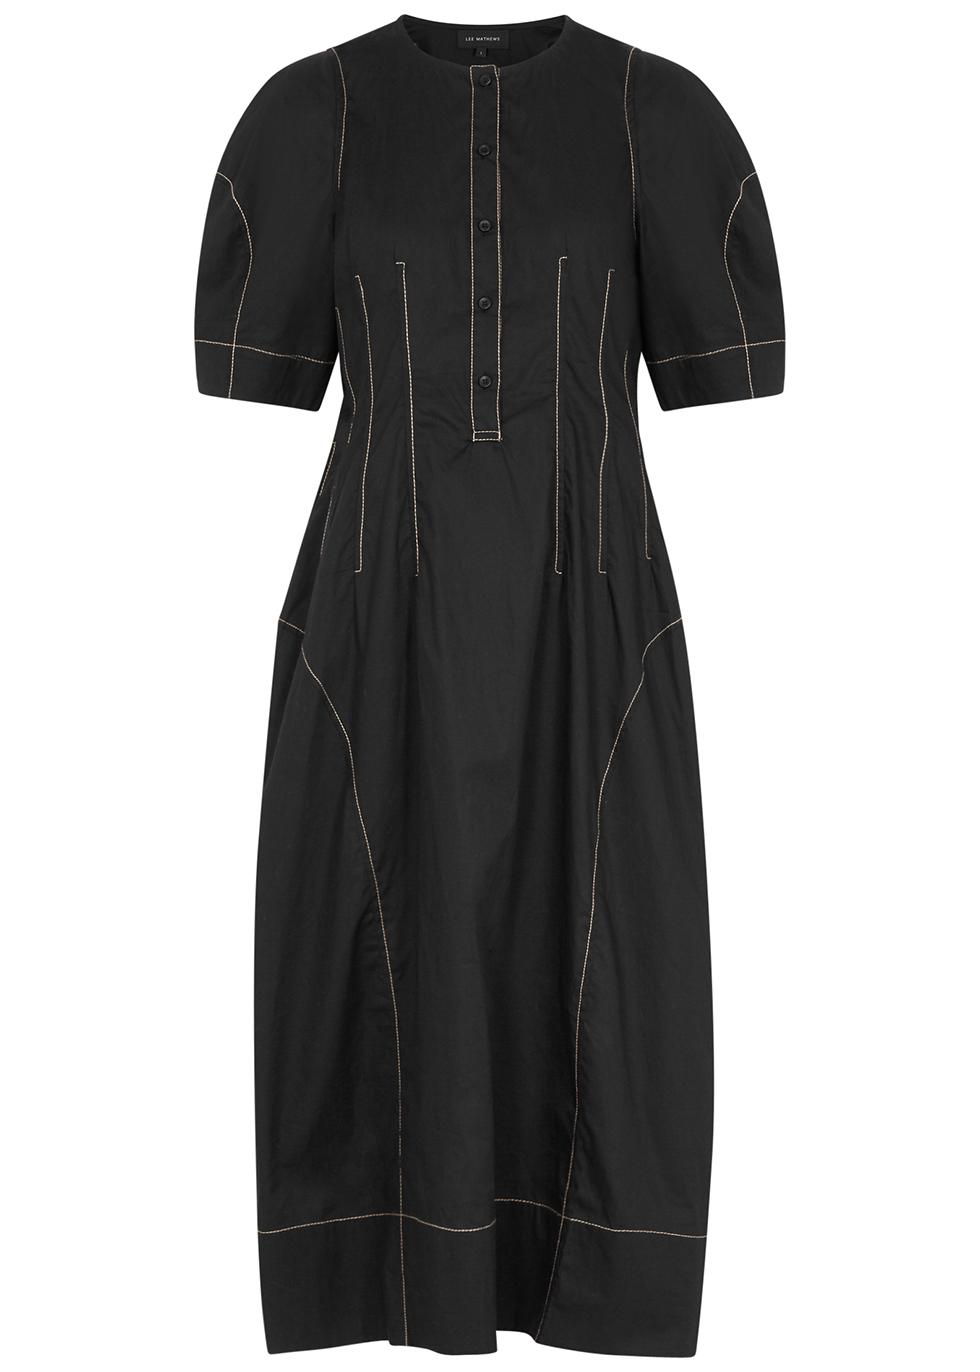 Nerissa black cotton midi dress